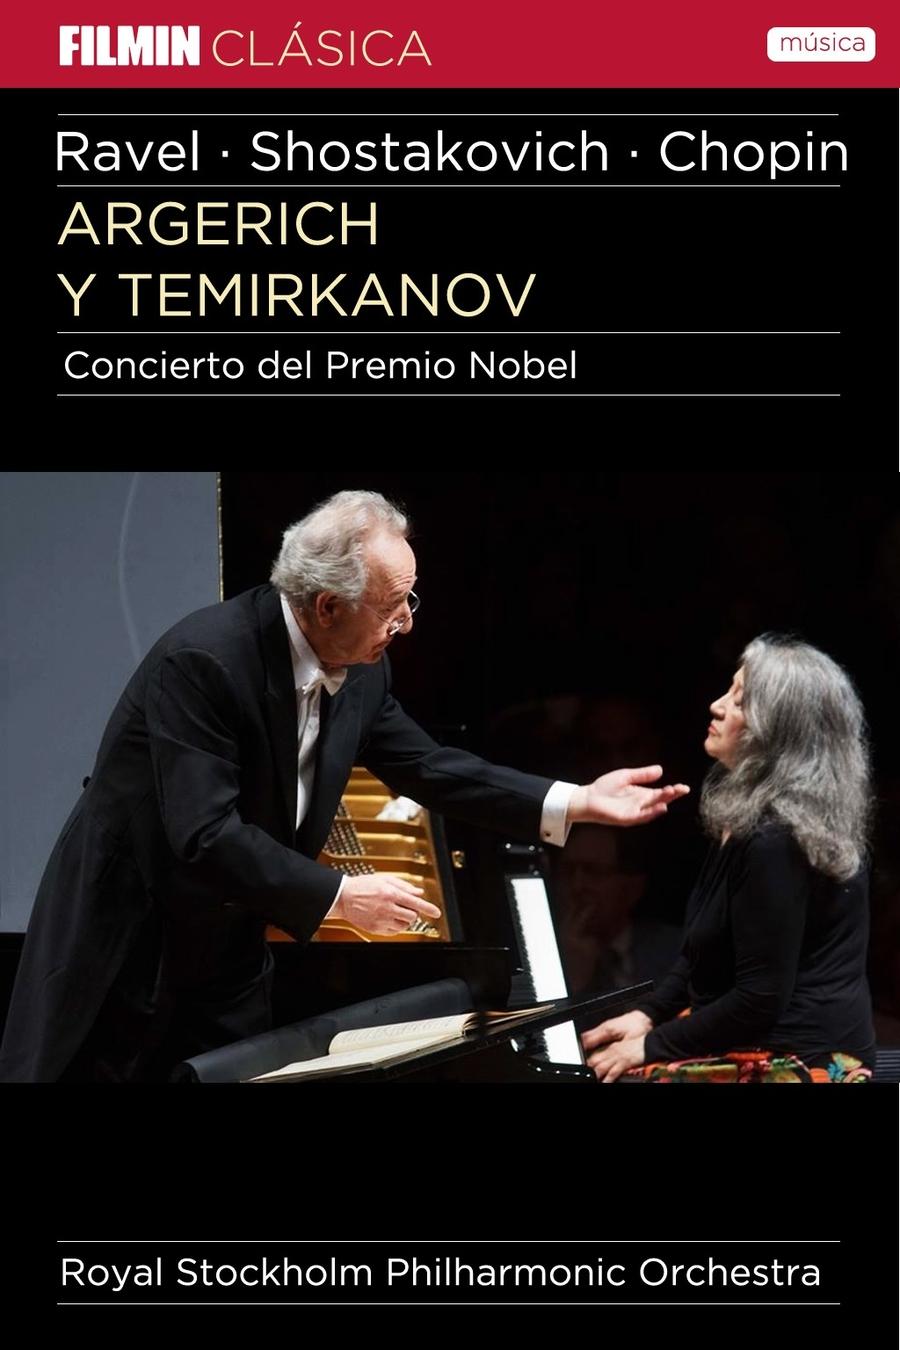 Argerich i Temirkanov